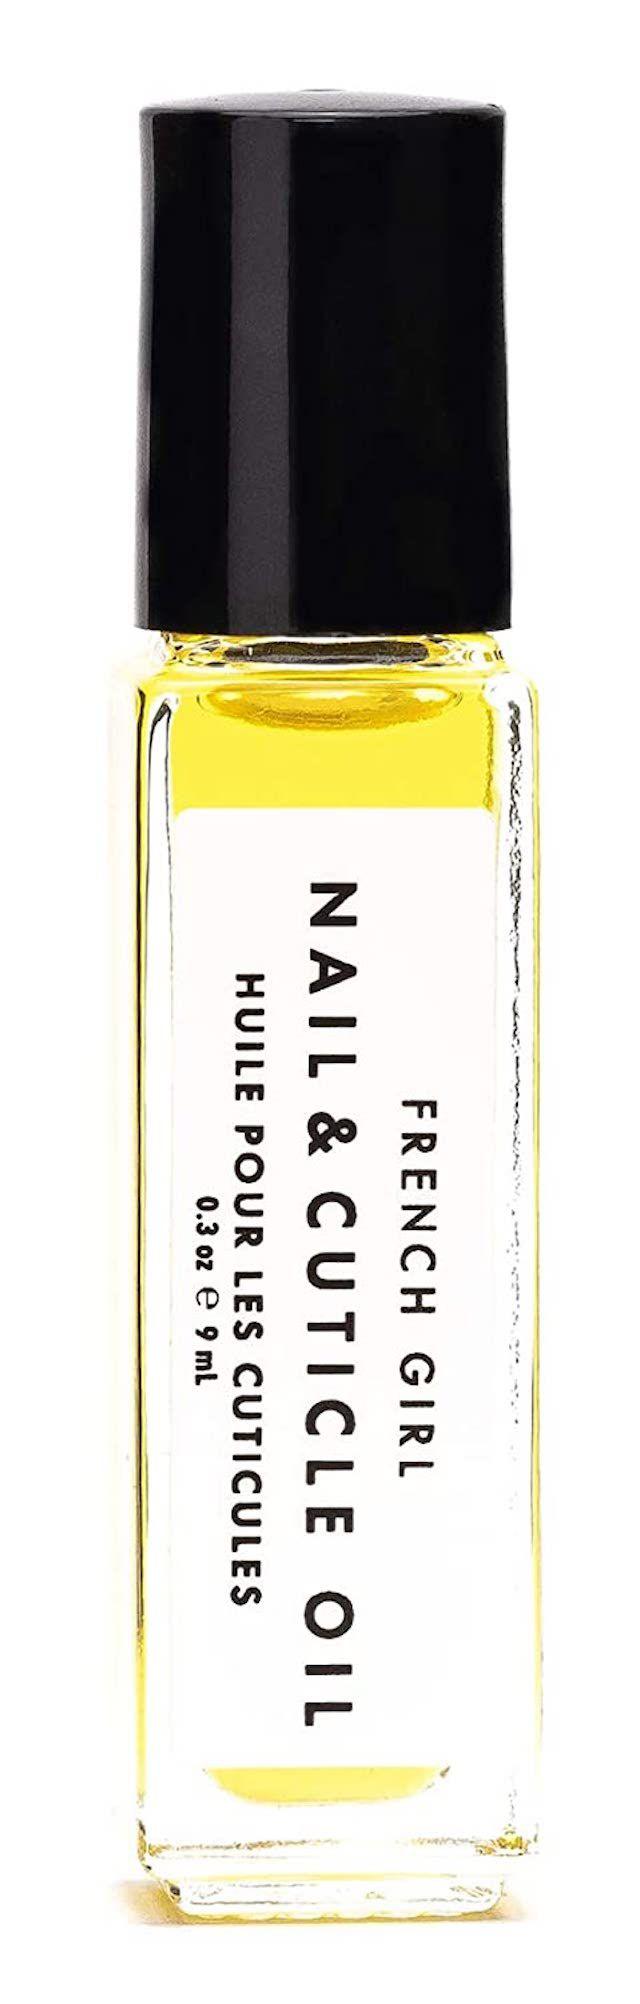 French Girl Organics Nail & Cuticle Oil